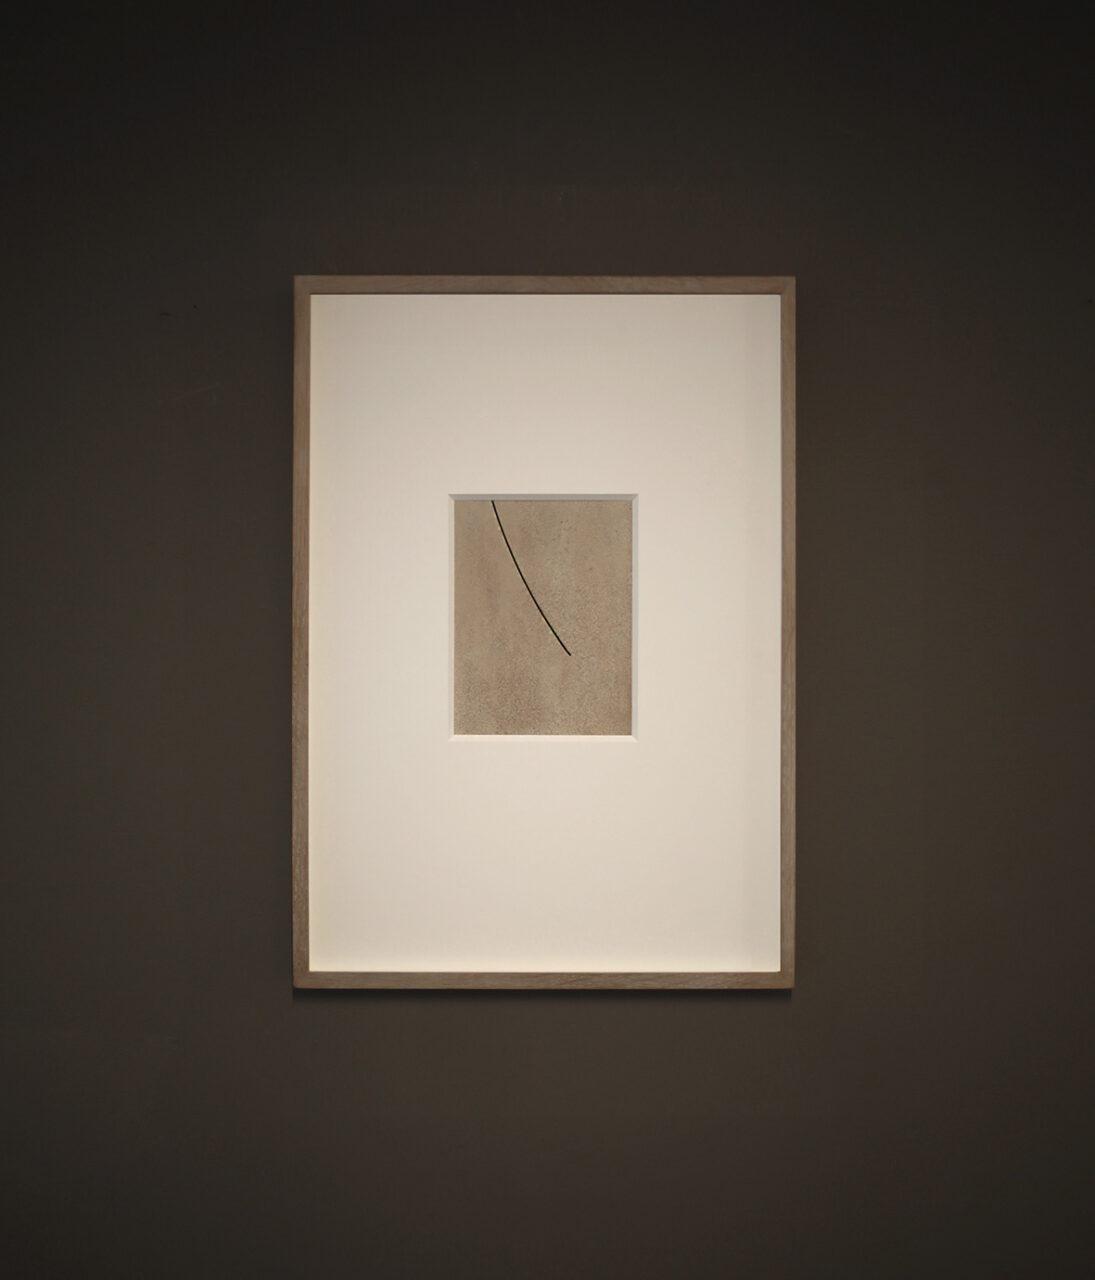 LUNETTE ( I ) 2020, limestone powder on Dibond panel, 44.0 x 32.0 cm